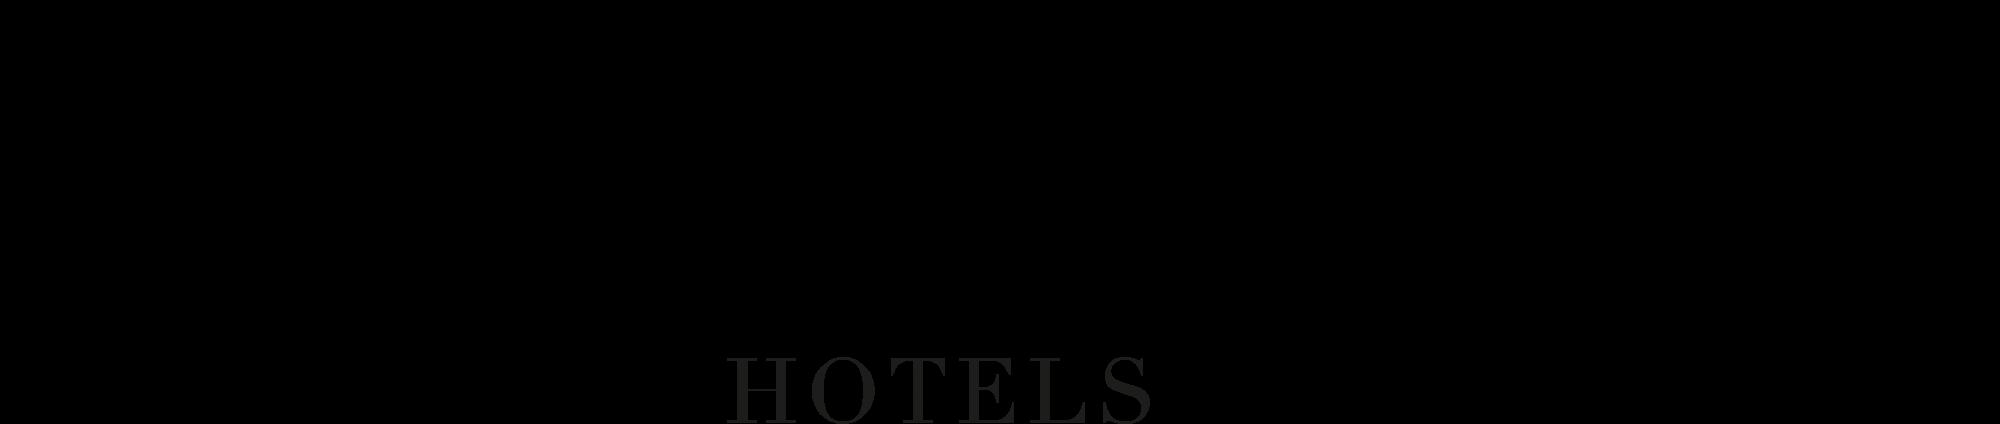 OE Hotel